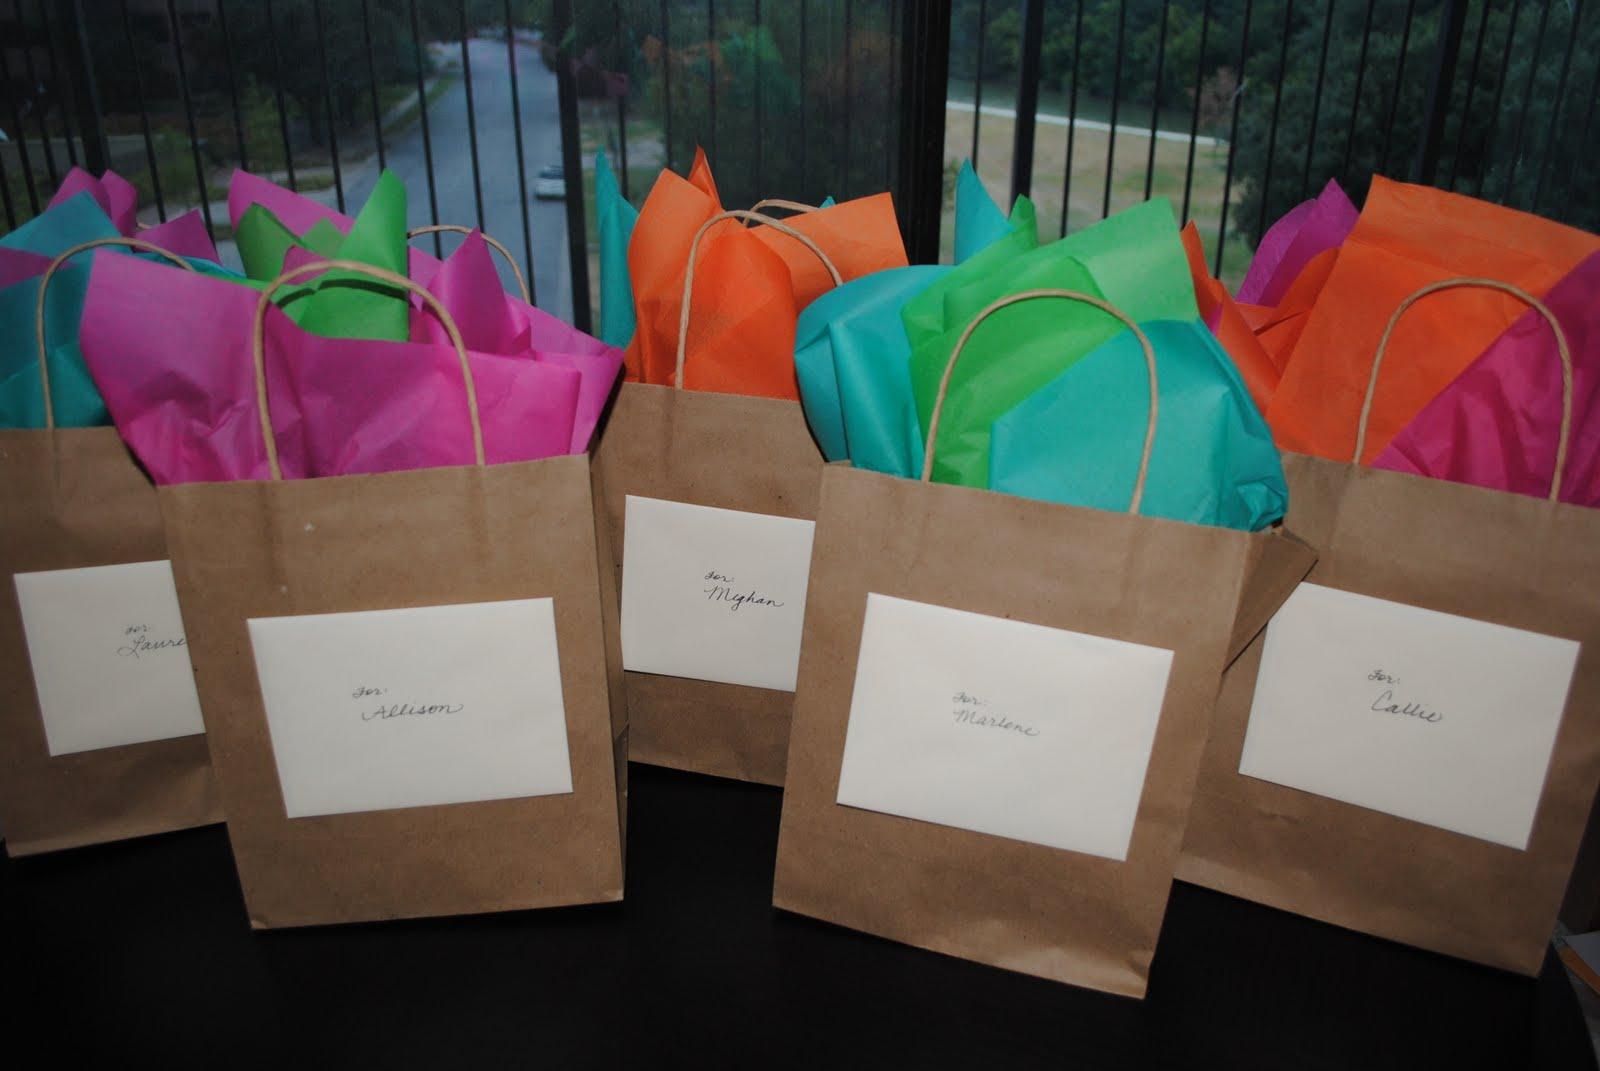 Good Hostess Gifts For Wedding Shower: Wedding World: Wedding Shower Hostess Gift Ideas